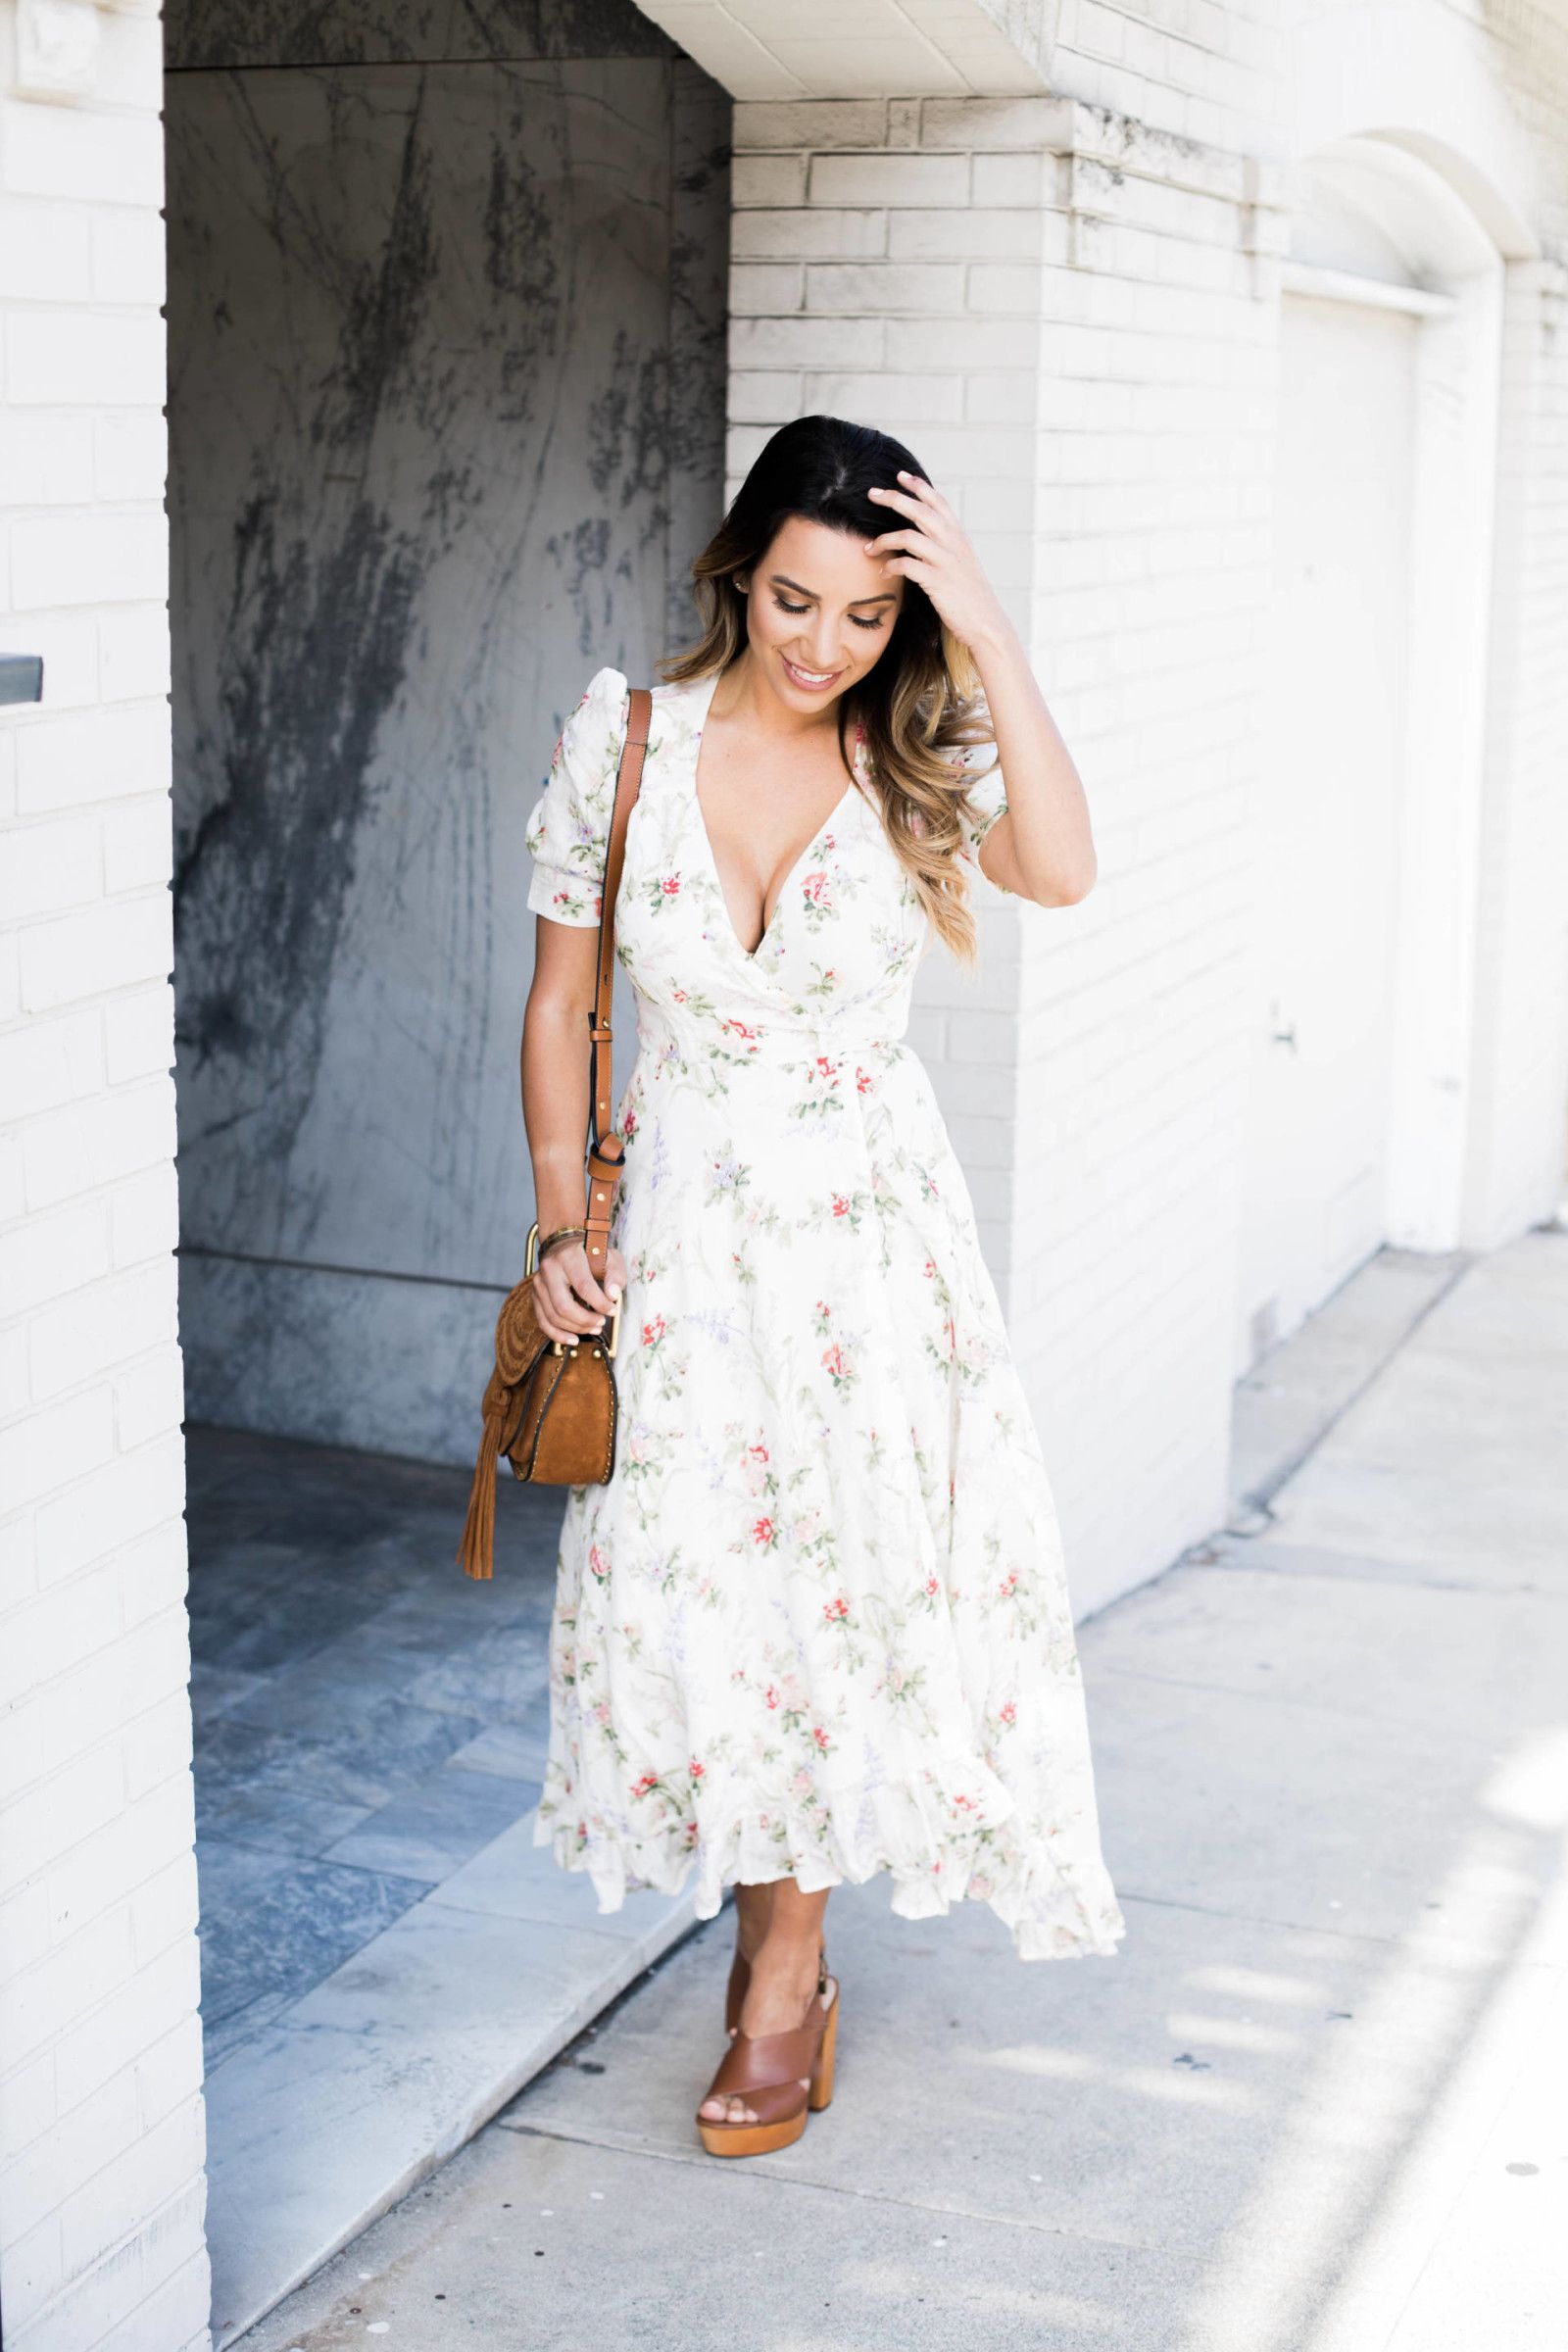 Ariana Lauren of #Fashionborn wearing dress: Denim & Supply Ralph Lauren, shoes: Seychelles, bag: Chloe